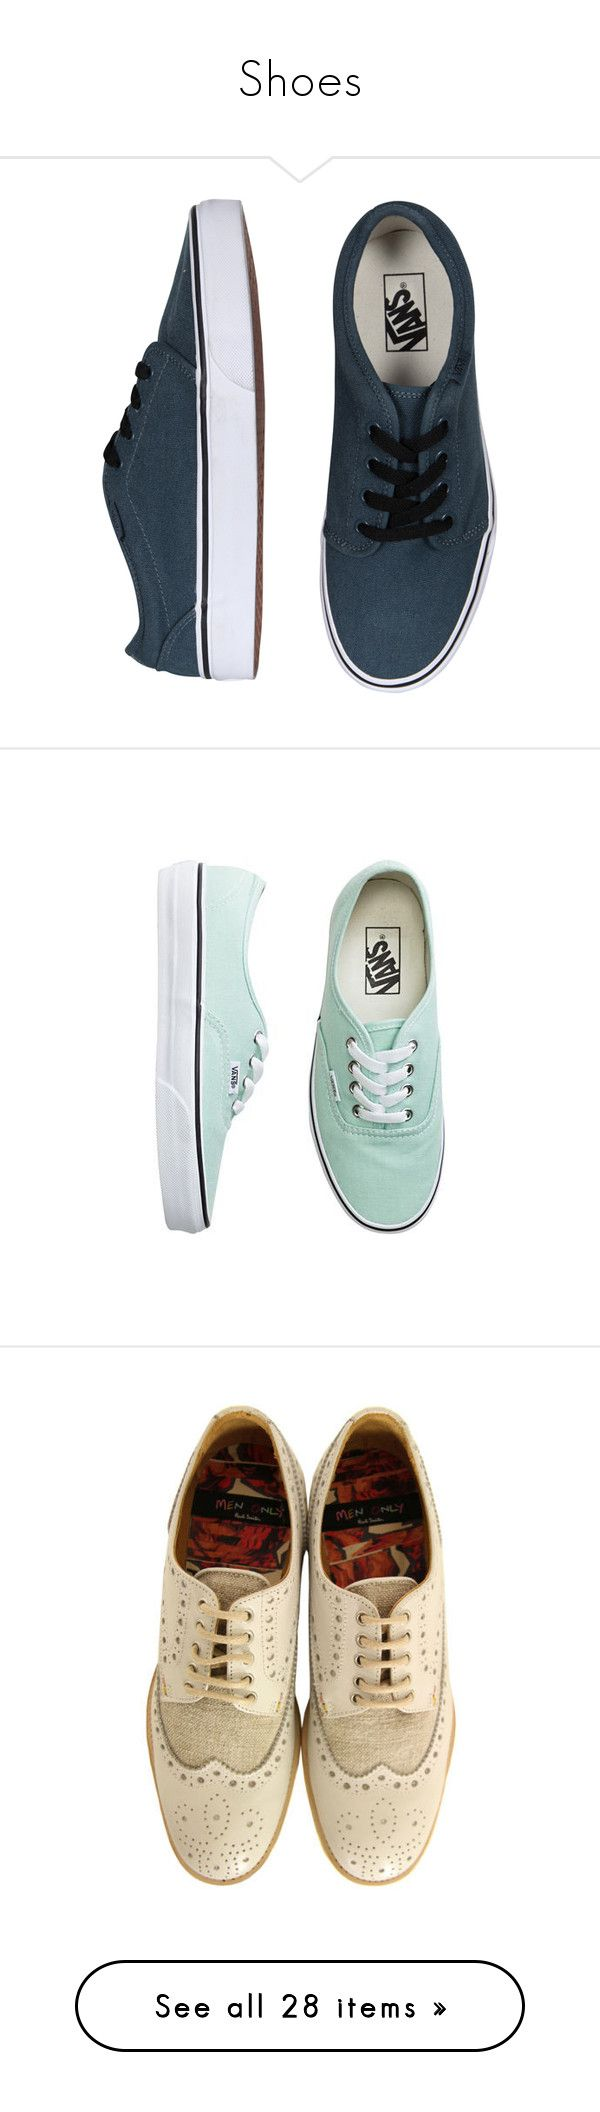 """Shoes"" by ltylerrr ❤ liked on Polyvore featuring shoes, sneakers, vans, tenis, women, vans sneakers, vans shoes, white sneakers, white trainers and white shoes"